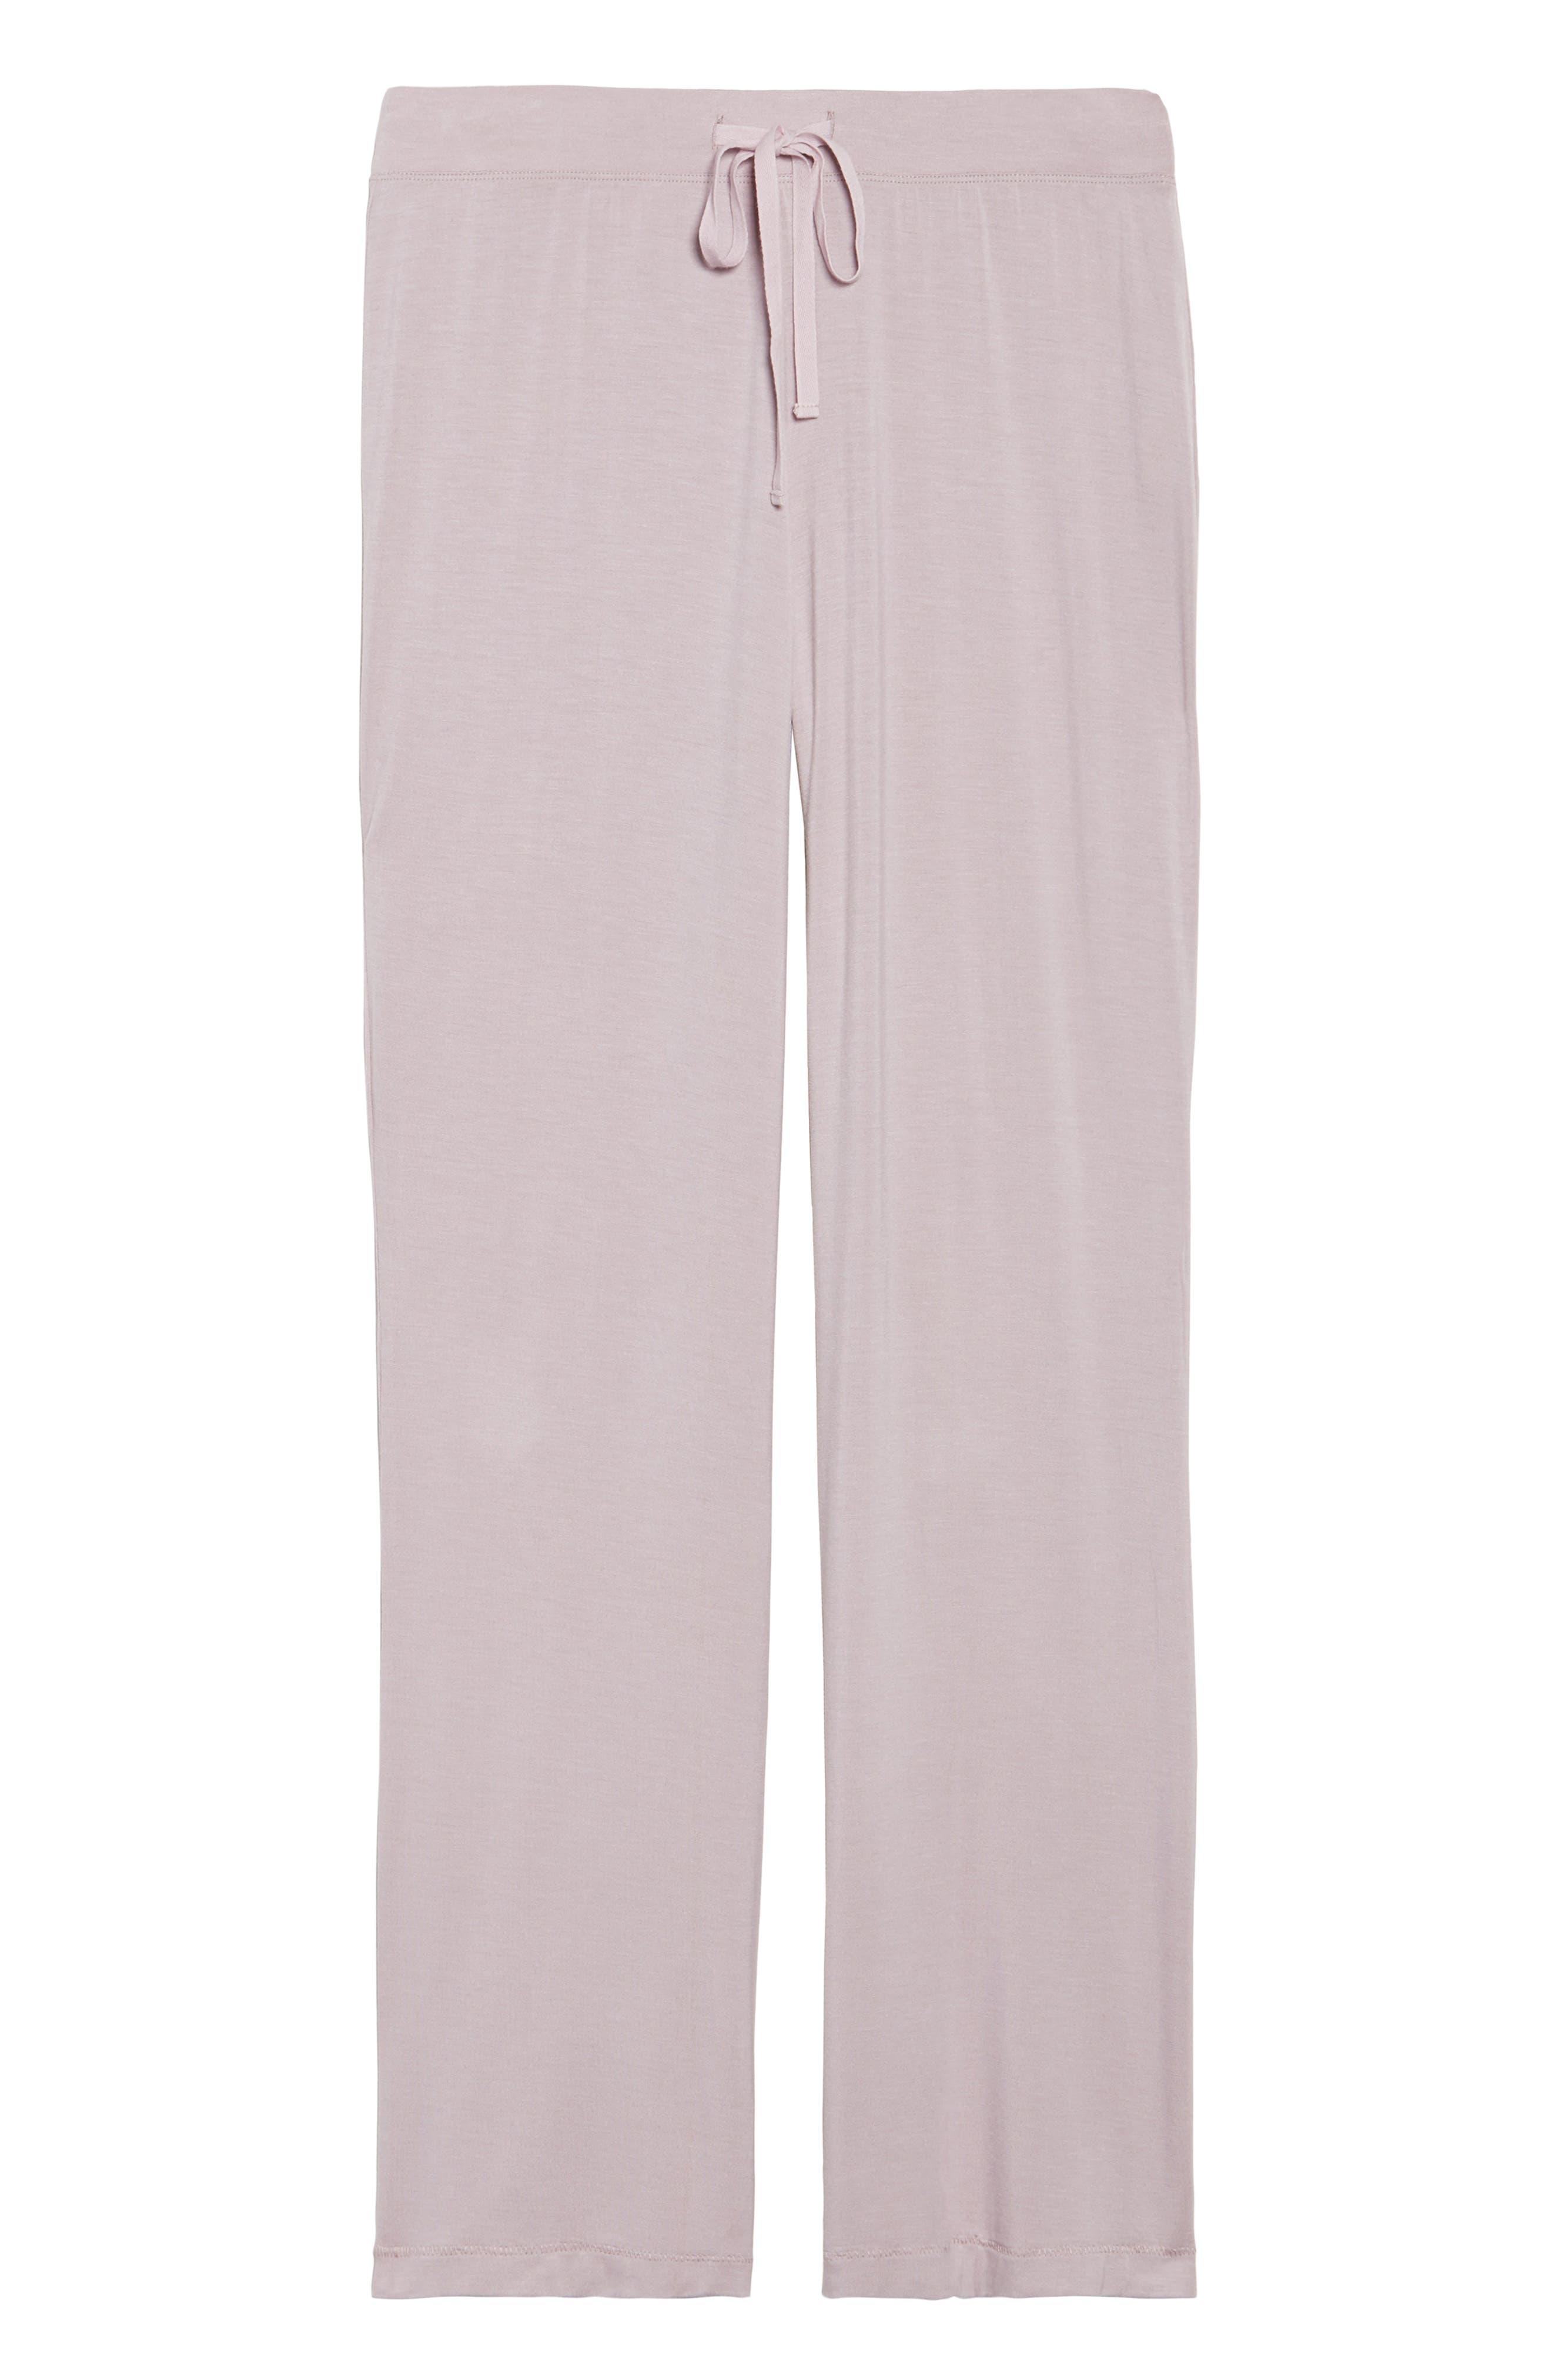 Polly Lounge Pants,                             Alternate thumbnail 6, color,                             650